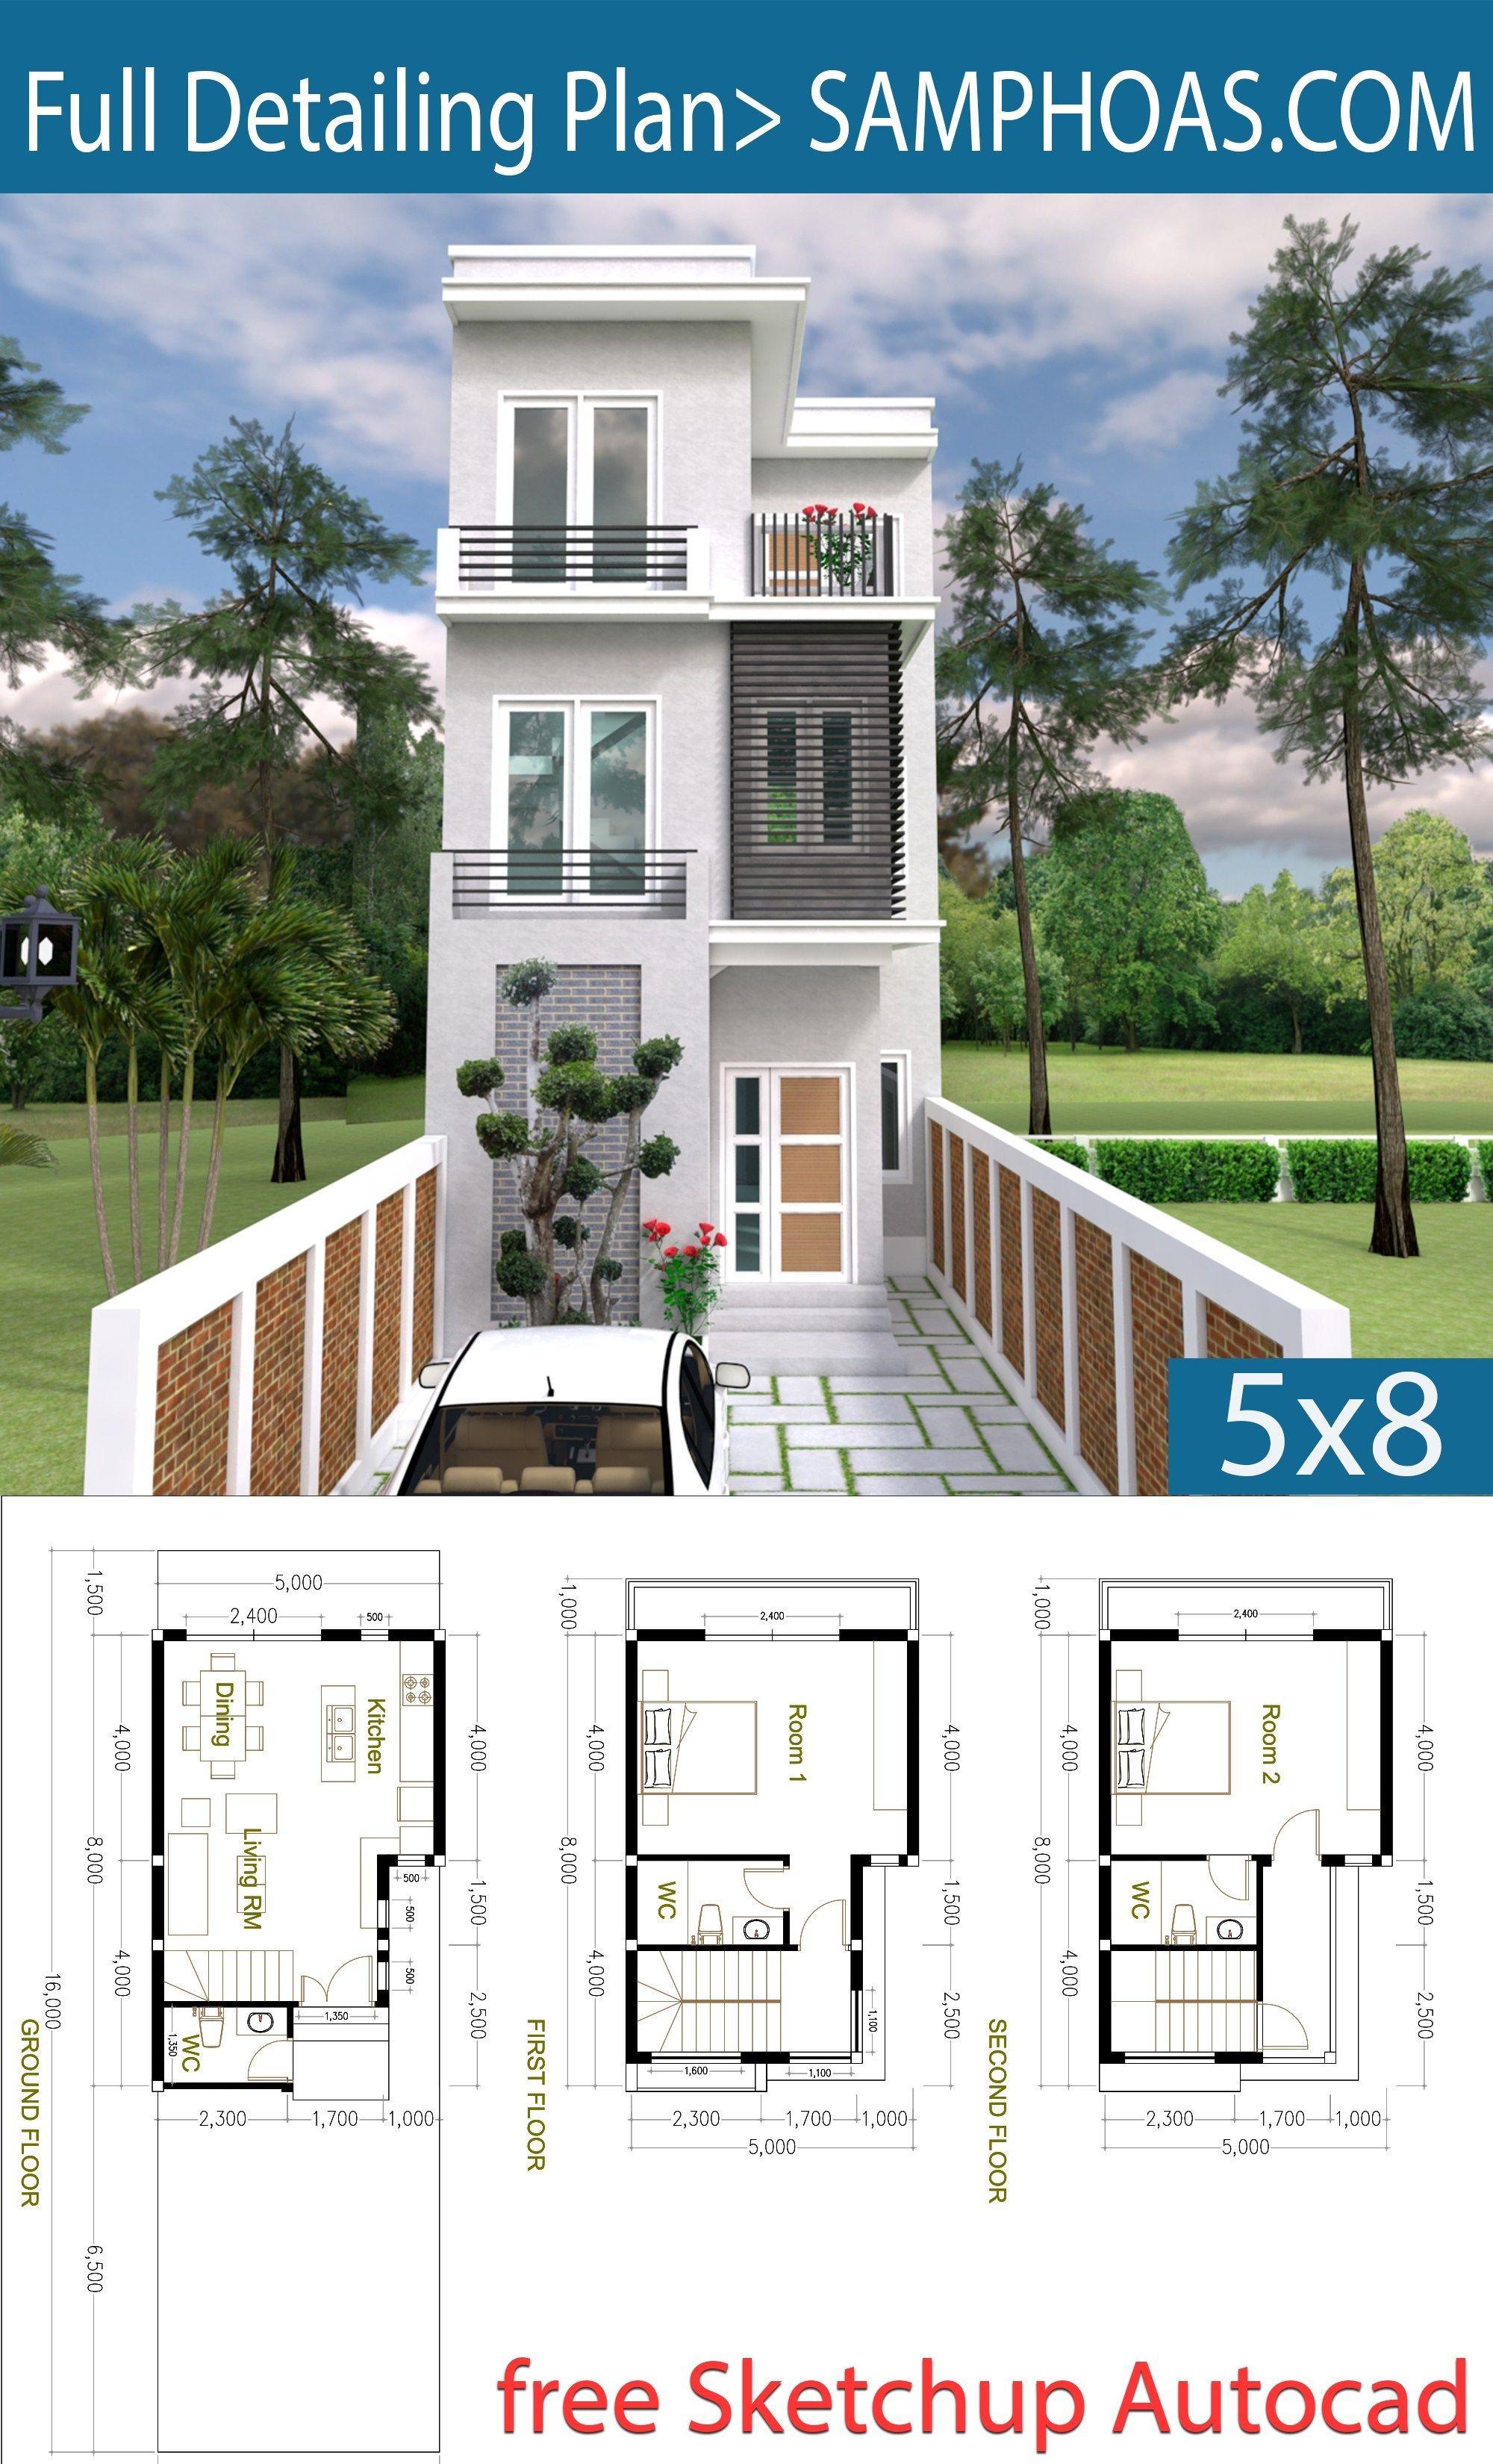 2 Bedroom Tiny Home Plan 5x8m Samphoas Plan Narrow House Plans Tiny House Loft Small House Design